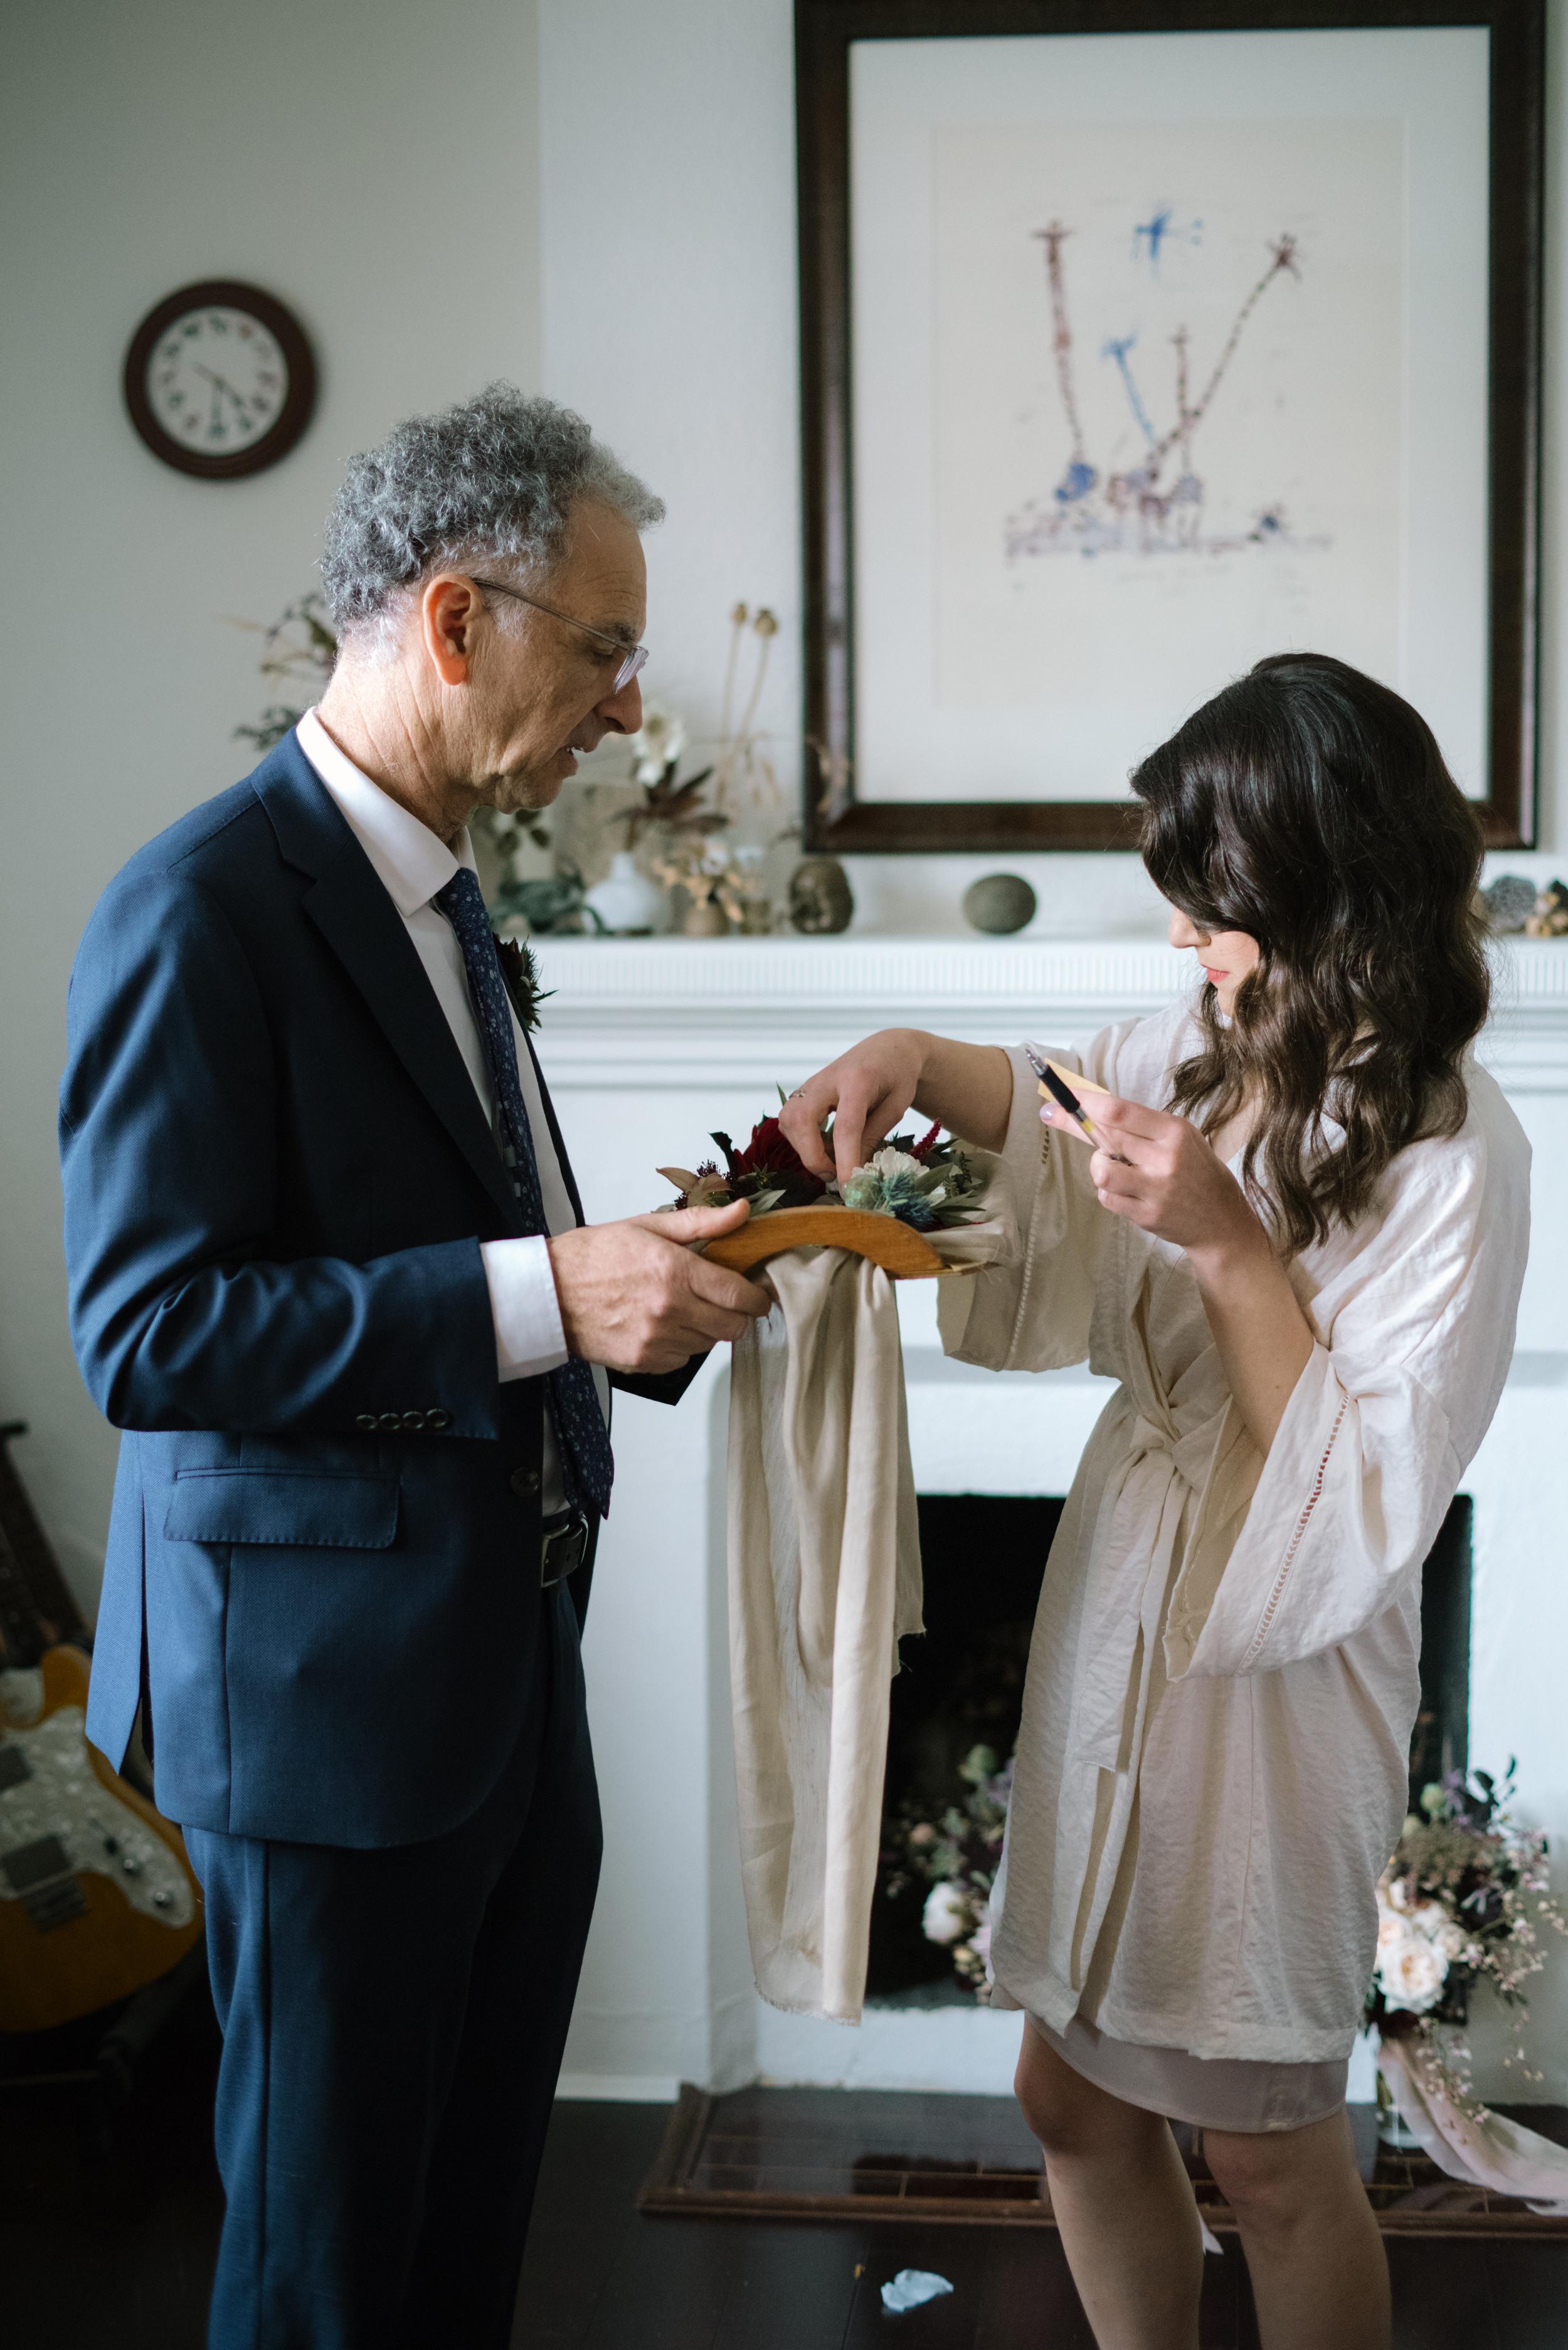 I-Got-You-Babe-&.Co.-Glasshaus-Wedding-Charlotte-Cameron0015.JPG